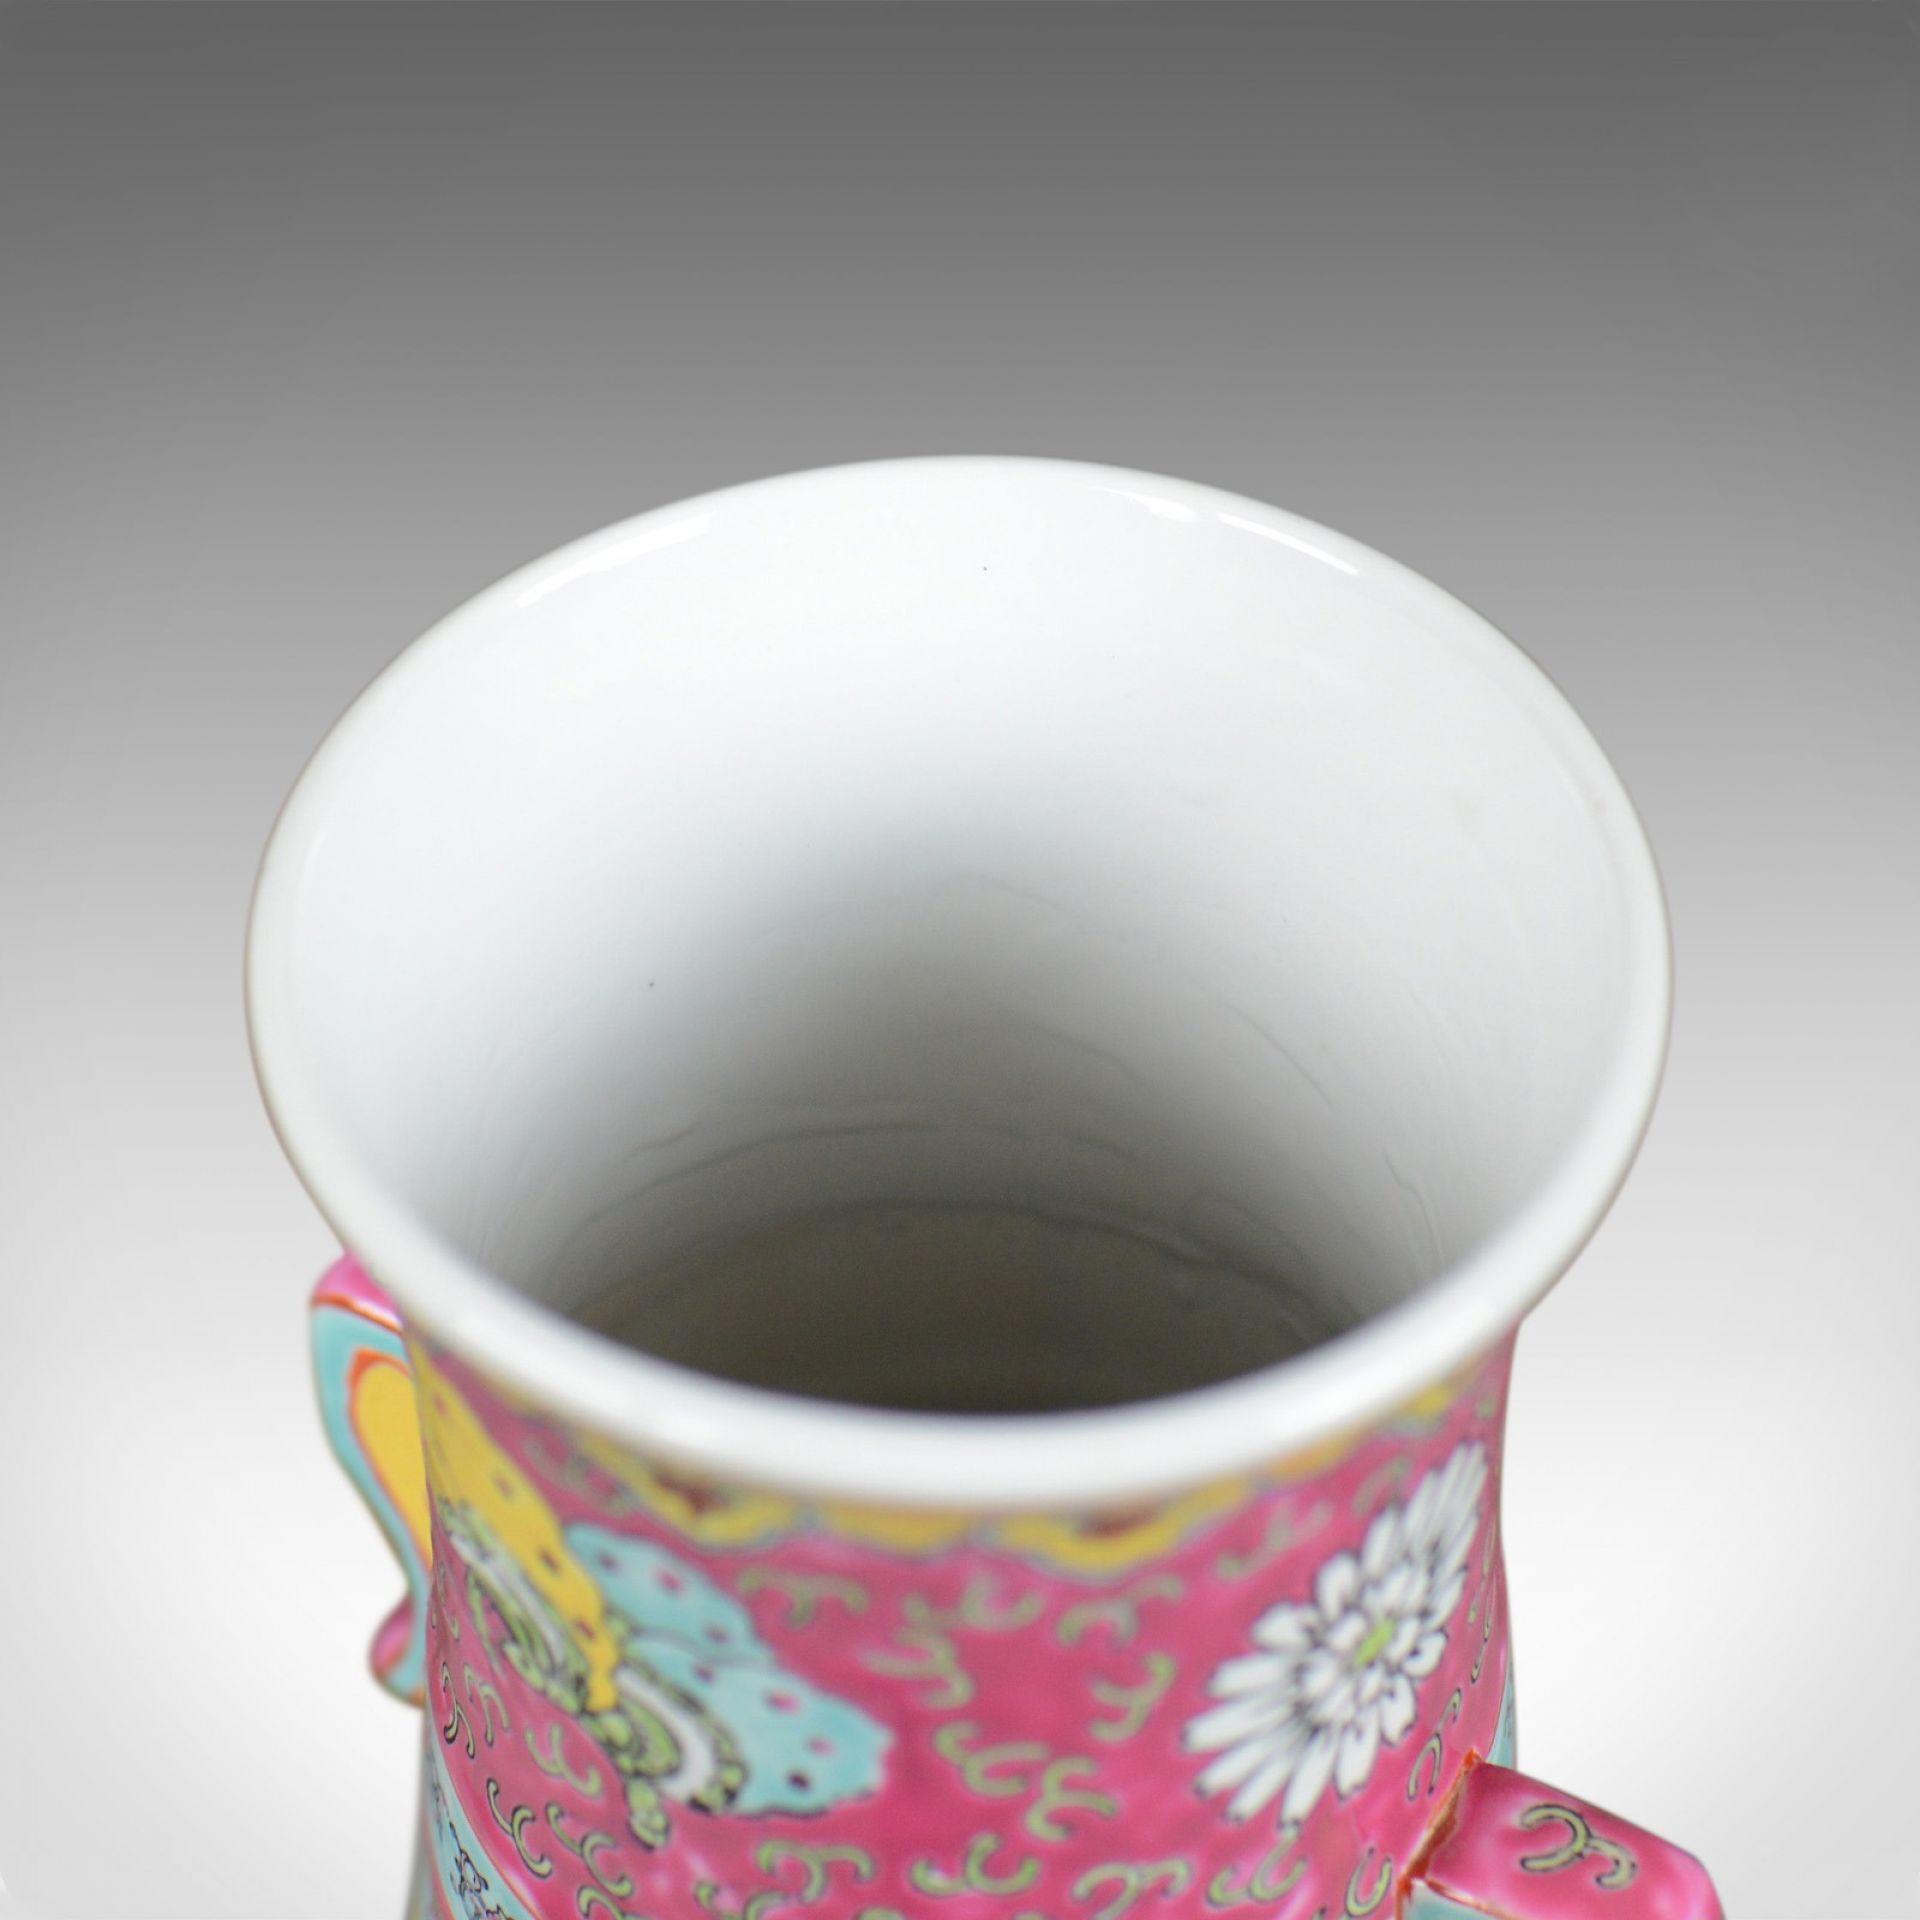 Large, Vintage, Japanese Baluster Vase, Decorative Oriental, Ceramic Urn C20th